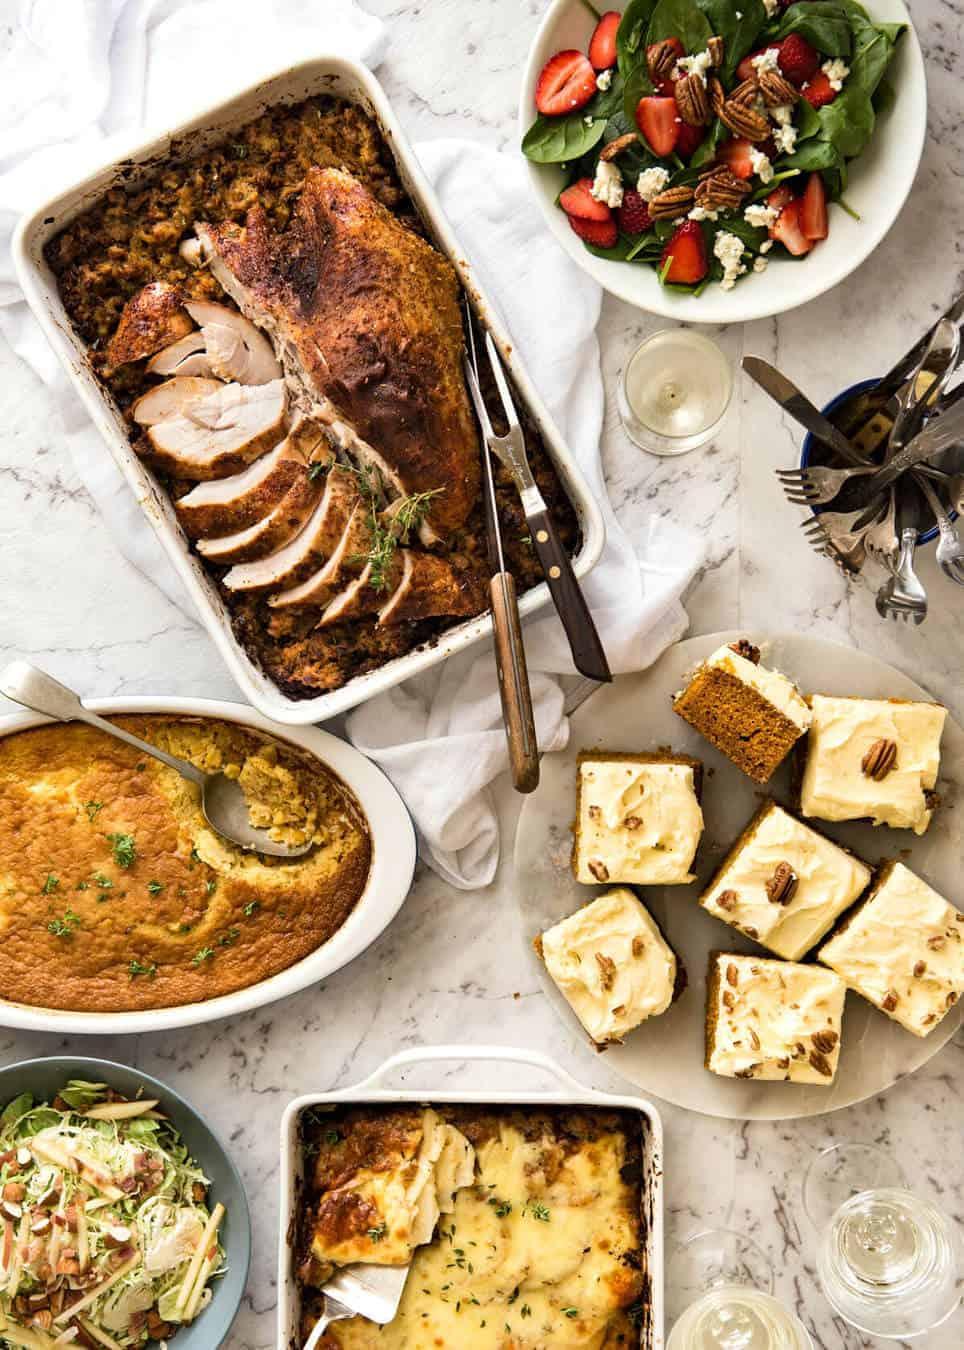 Easy Thanksgiving Menu - Cajun style! www.recipetineats.com